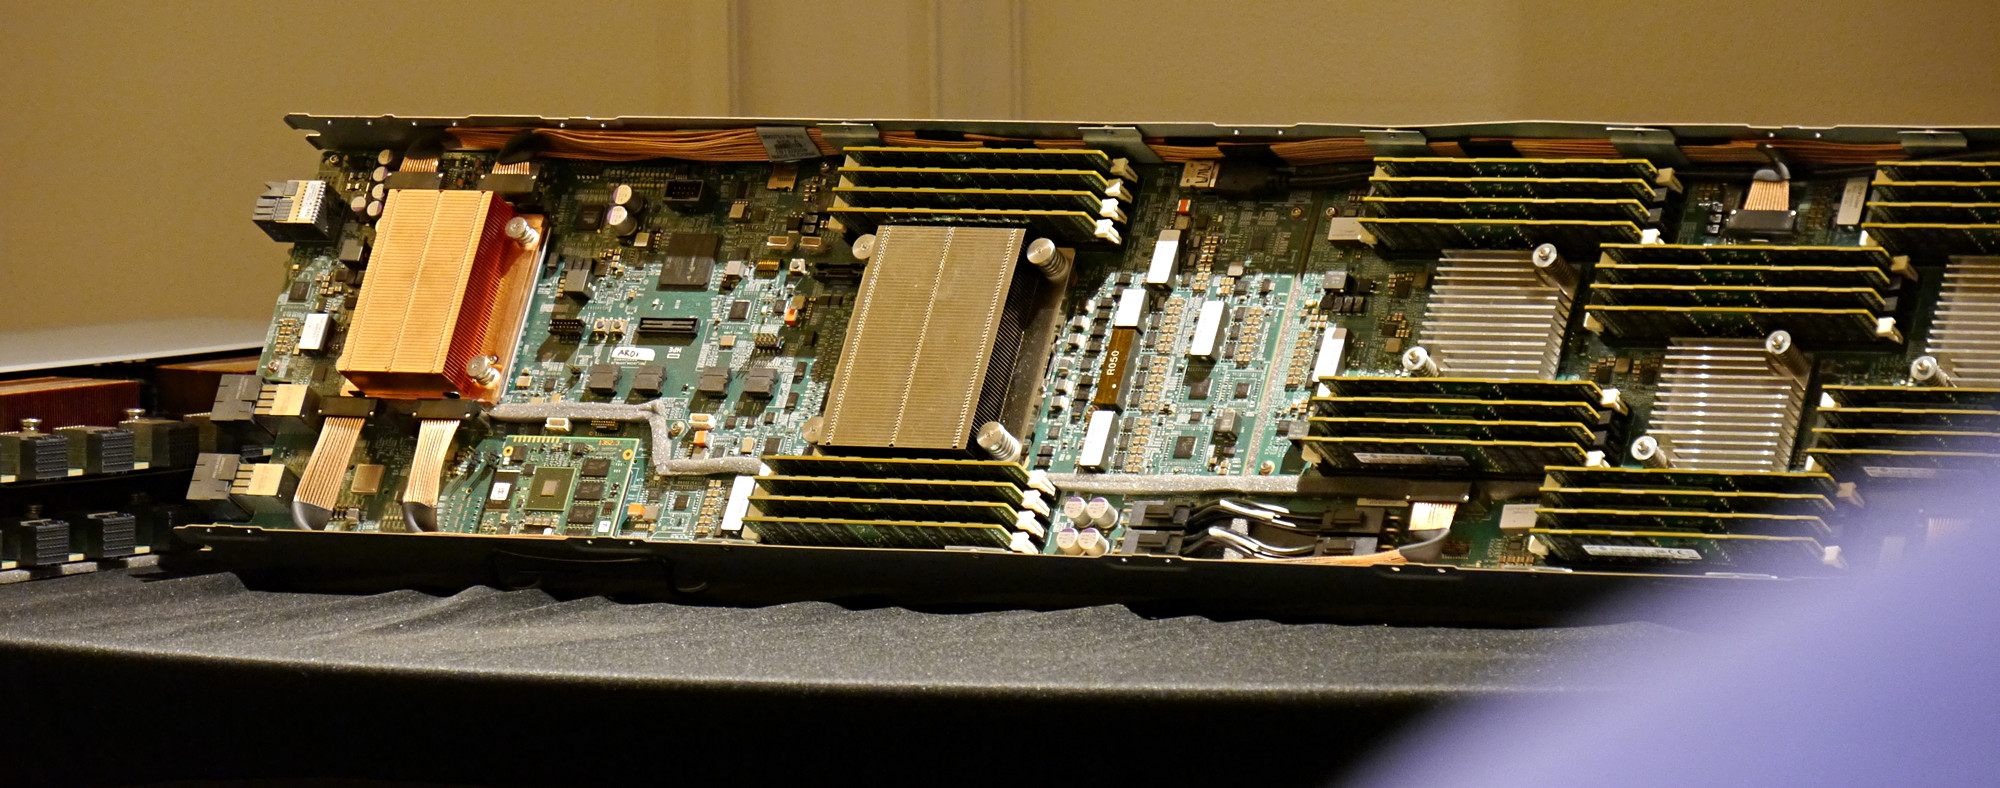 Memory-Driven Computing: HPE zeigt Prototyp von The Machine -